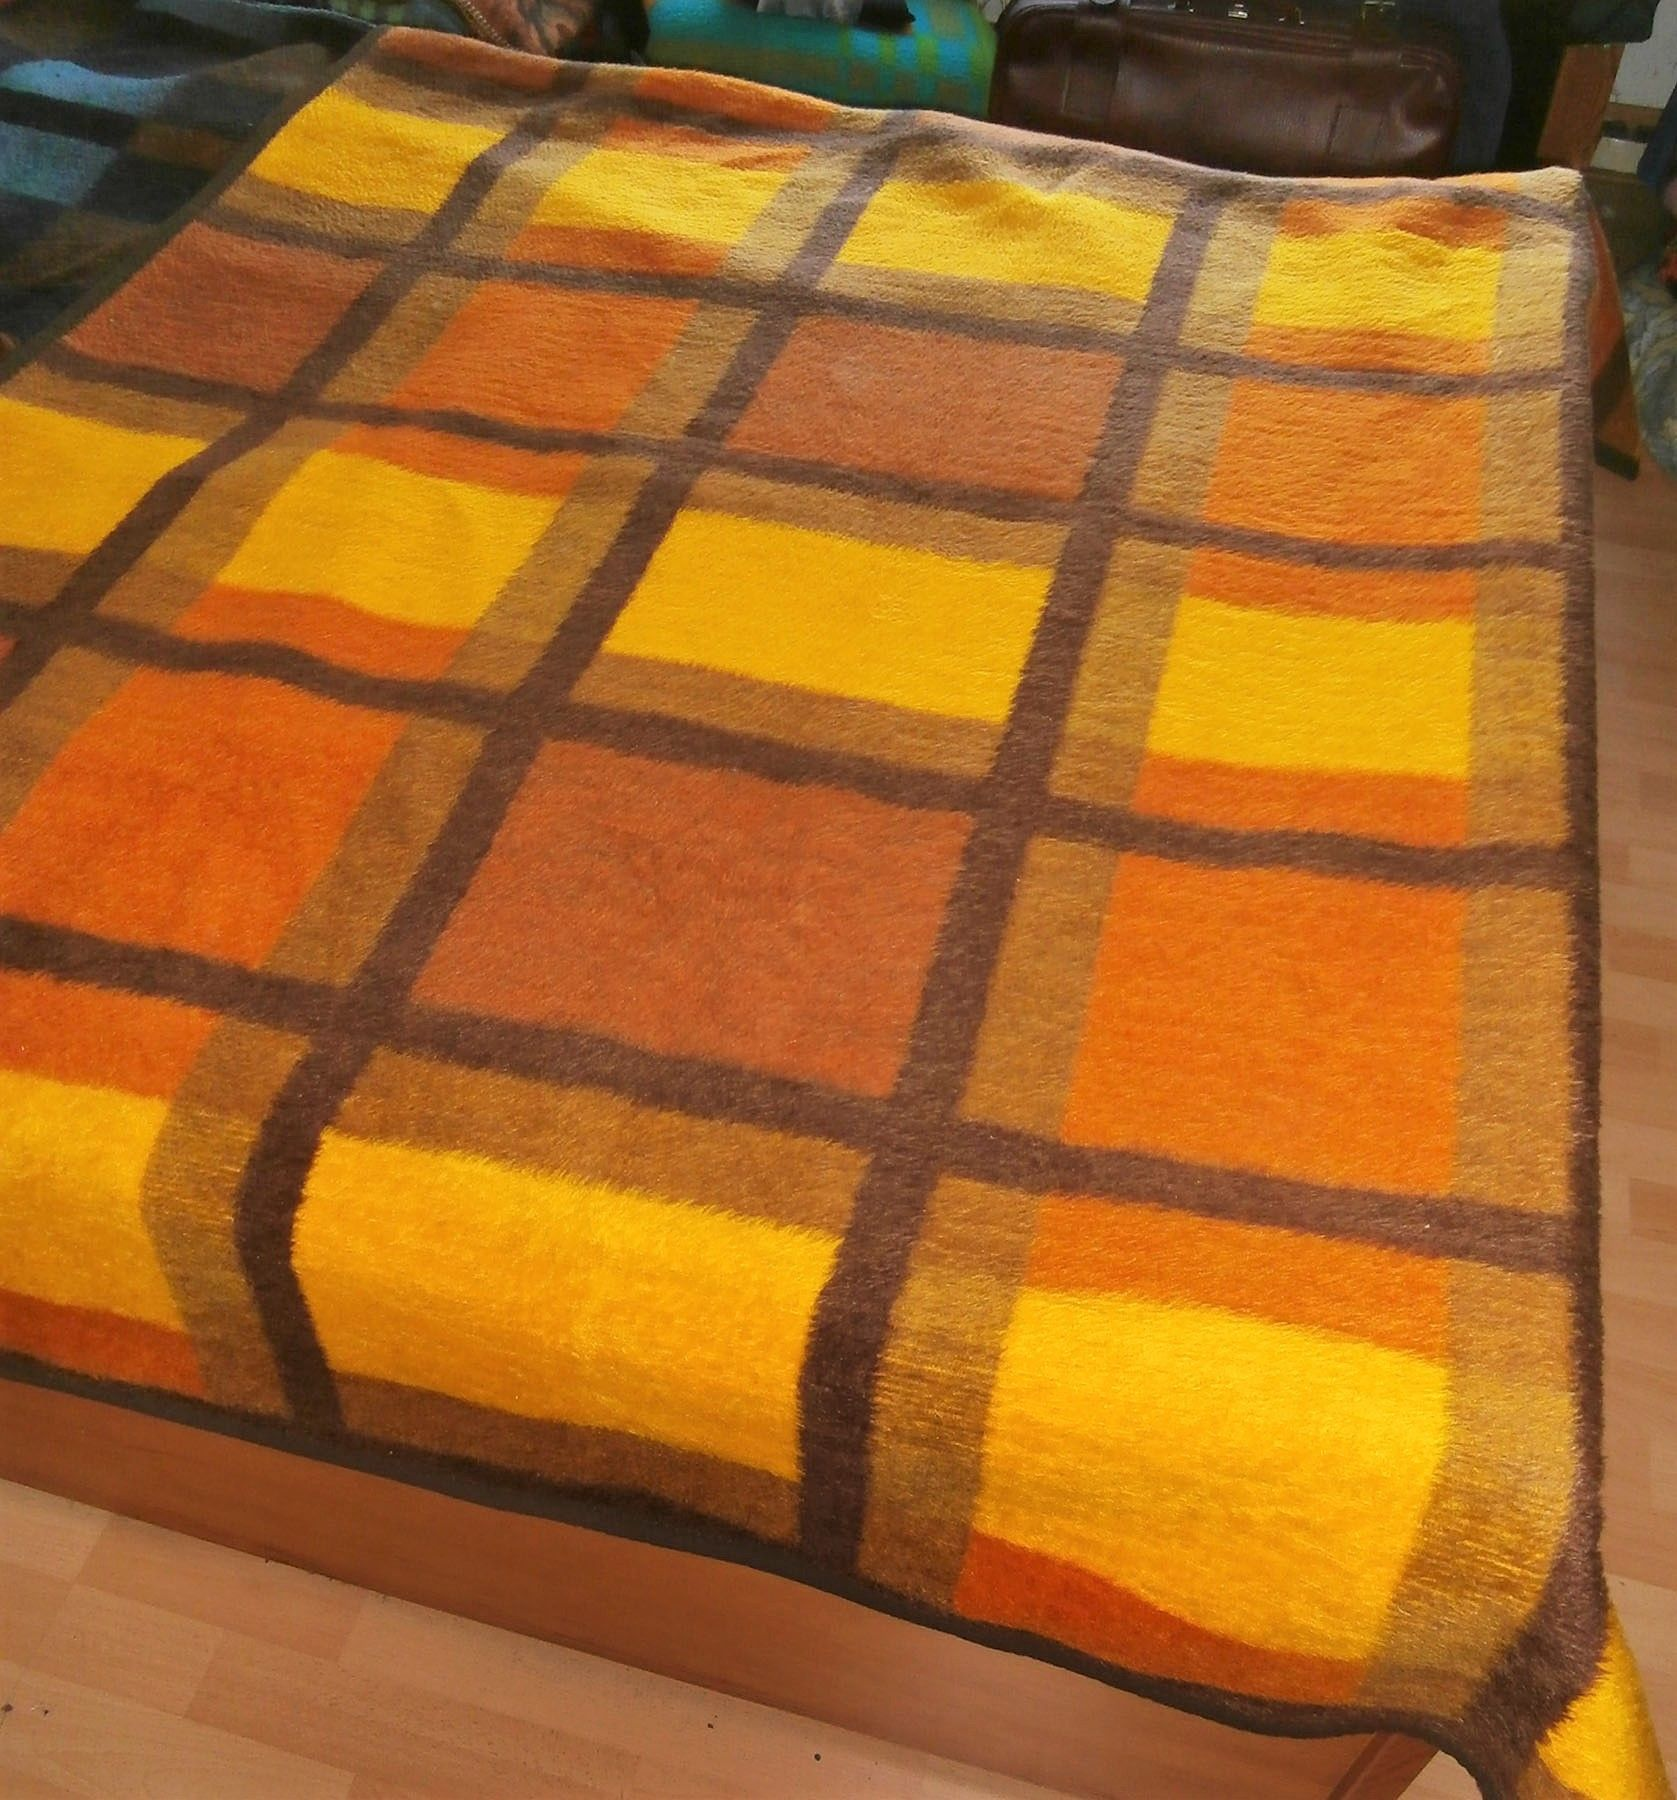 Prop Woolblanket Retroblankets Blanketmuseum Instagram 50s 60s Production Oudedekens Vintageblanket Vintagedeken Retrodeken Wolldecke Stoffe Decke